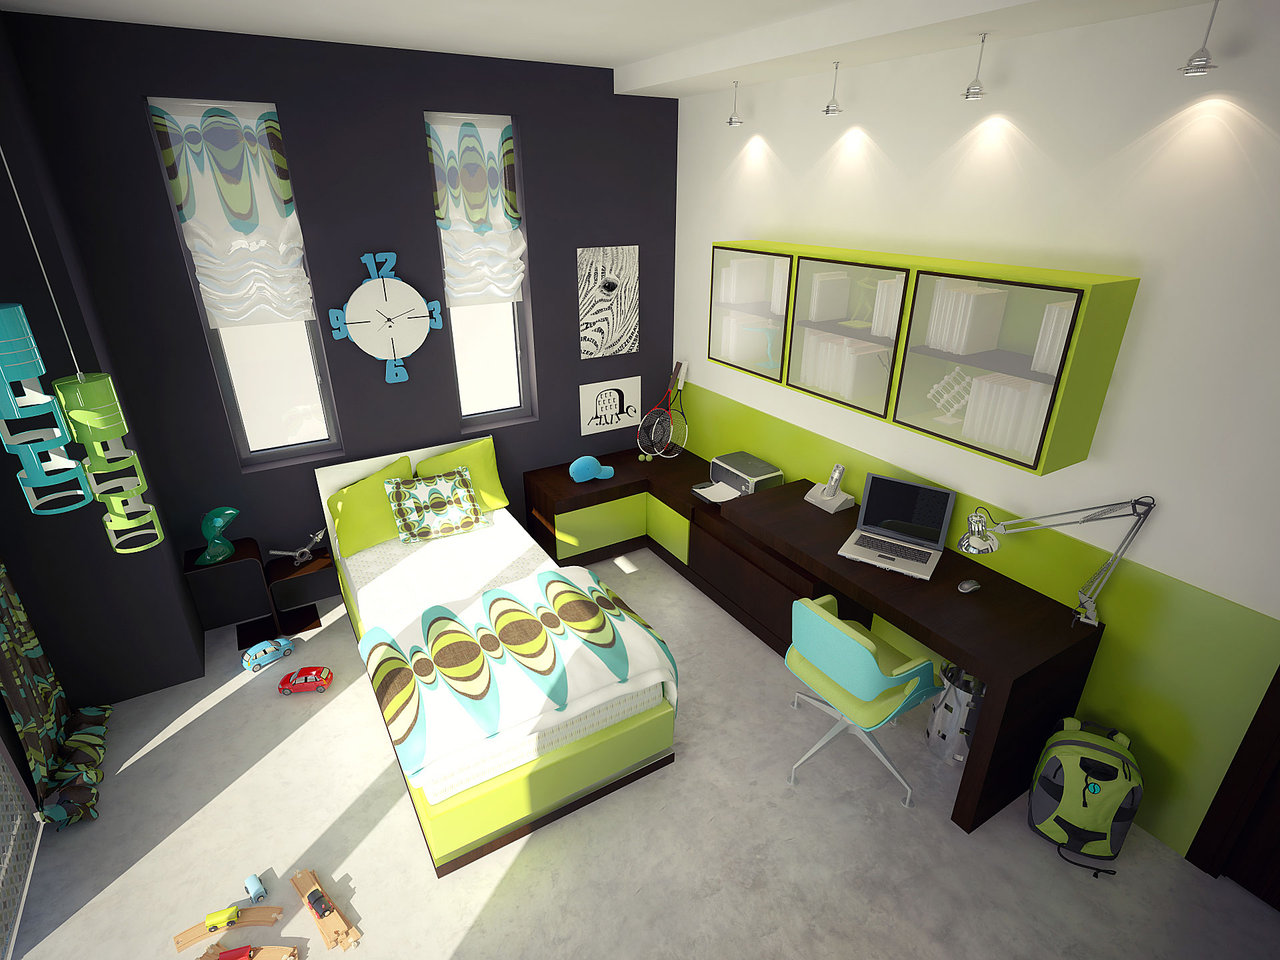 Bedroom Decorating Ideas Using Green Furniture Design On Vine